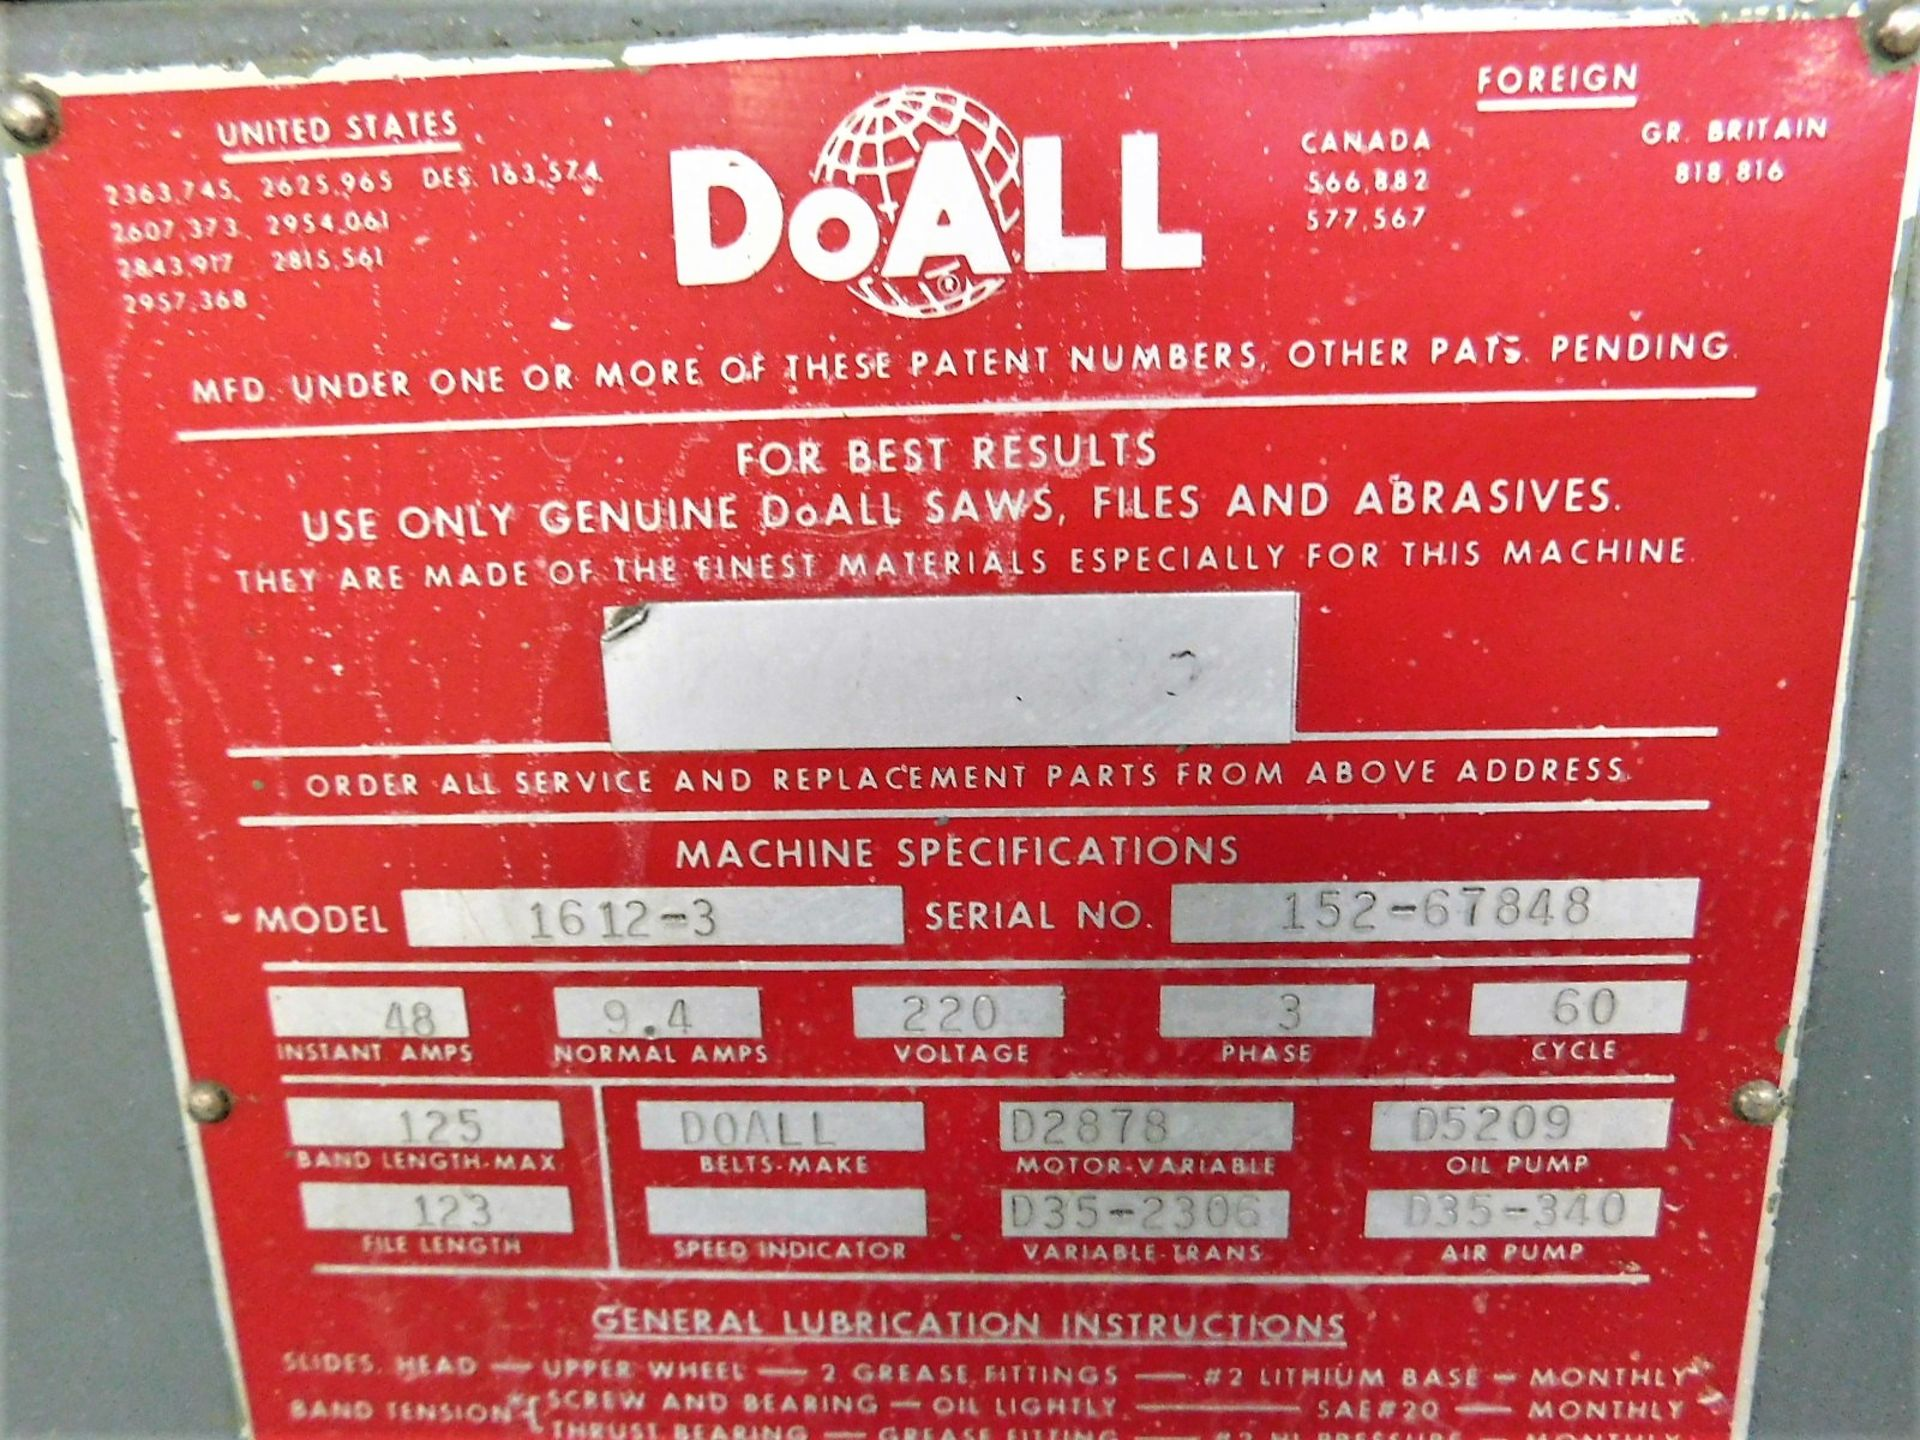 "Lot 15 - DOALL VERTICAL BANDSAW, MODEL 1612-3, S/N 152-67848, W/ DOALL BLADE WELDER, TABLE 30-1/2"" X 24"""